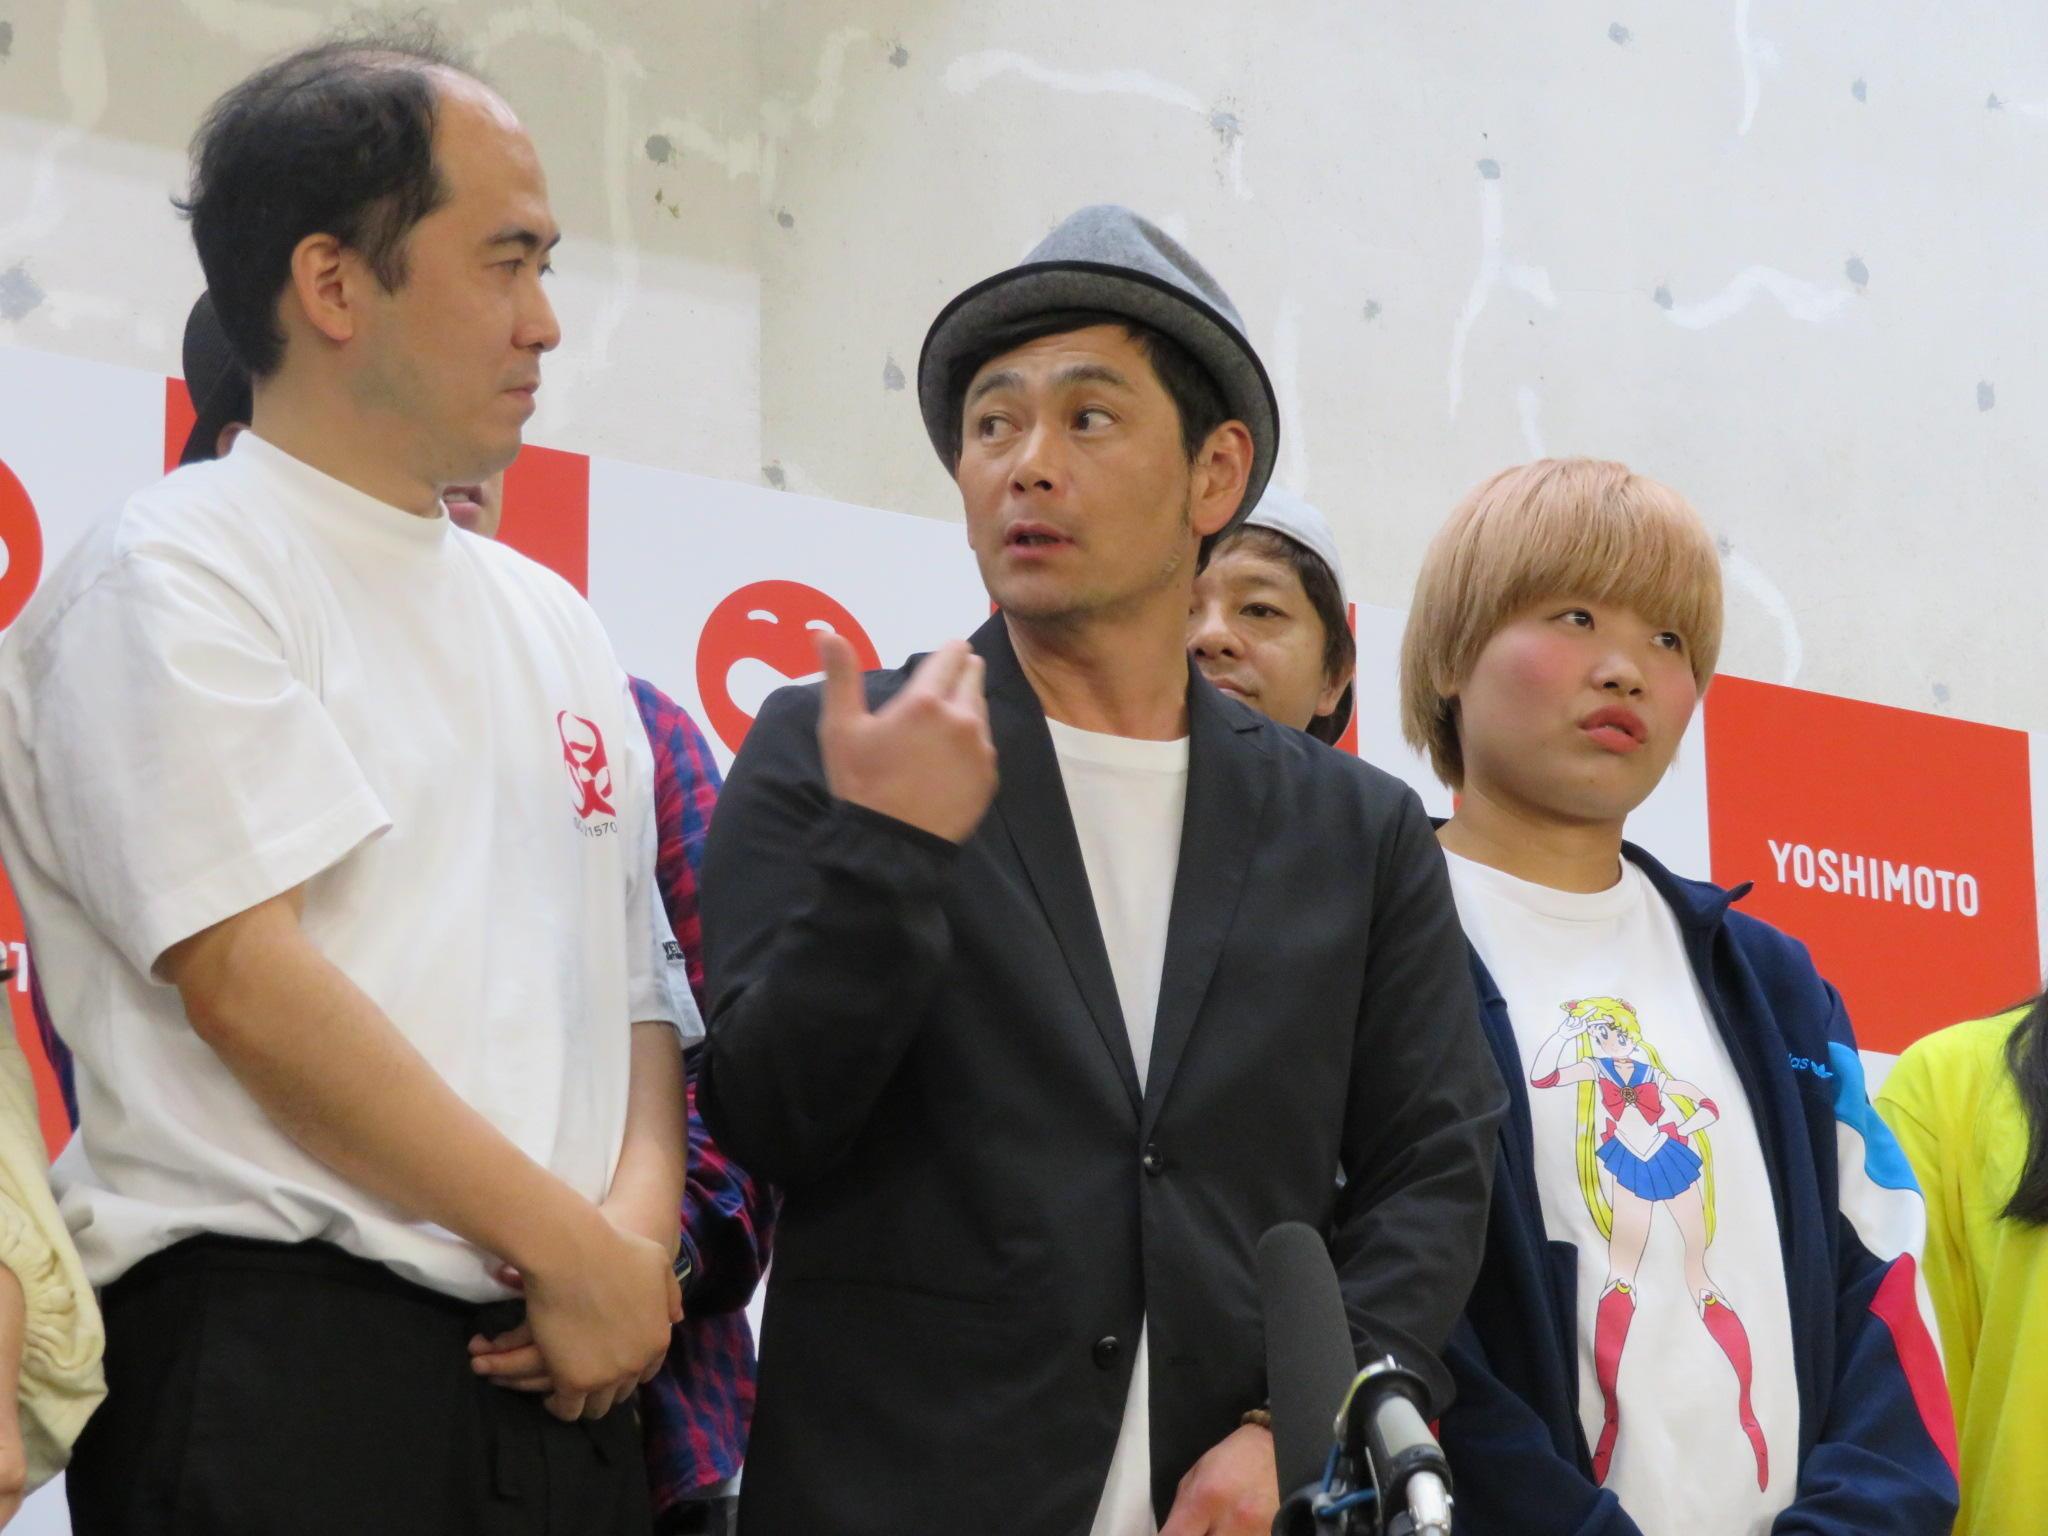 http://news.yoshimoto.co.jp/20181010090158-0368ed94a273a5b87eef3958e94c777fbc9f21e8.jpg